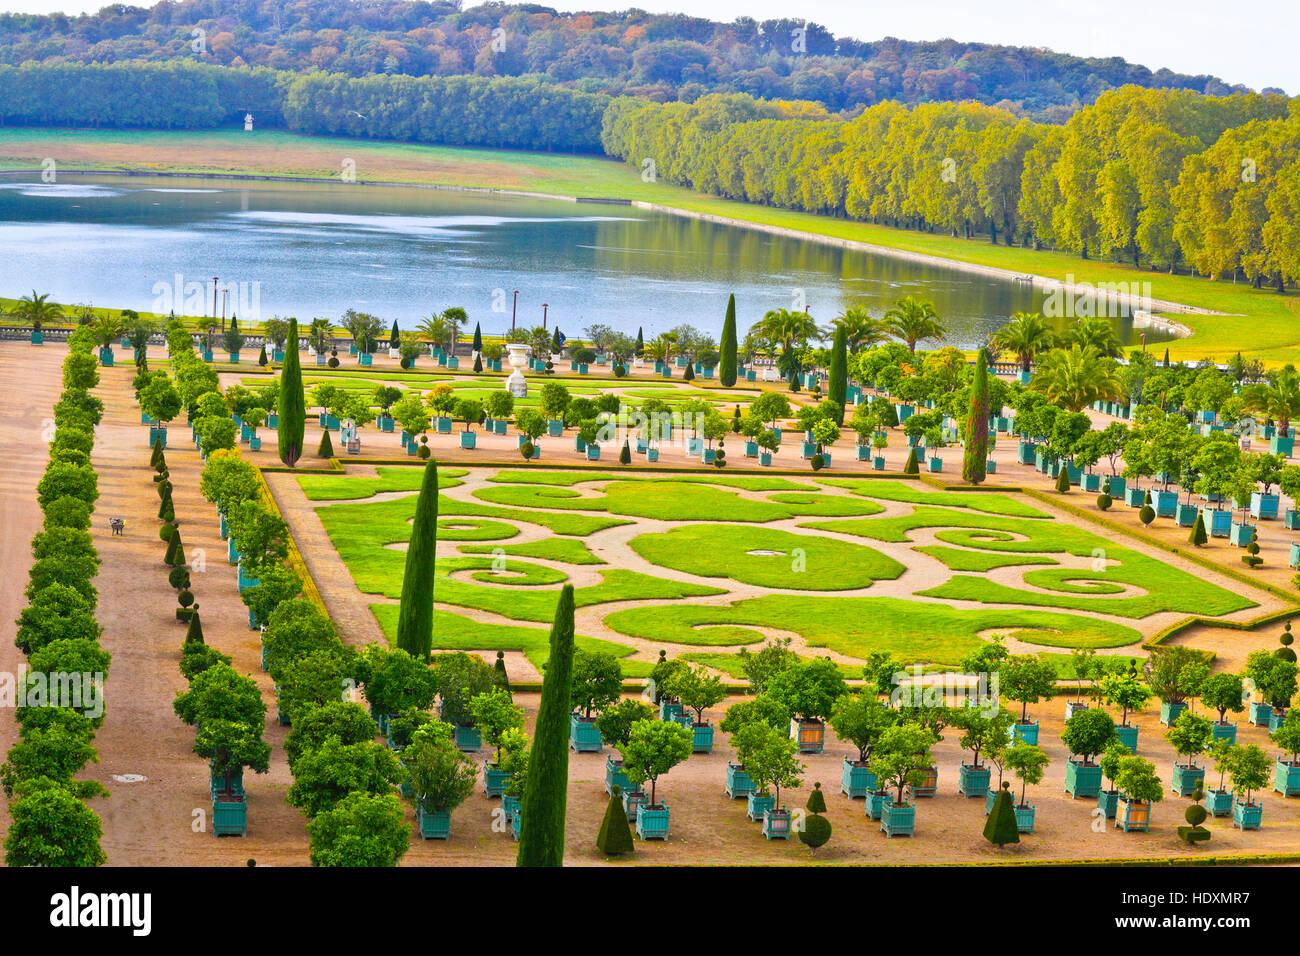 Giardini di versailles l orangerie chateau de versailles